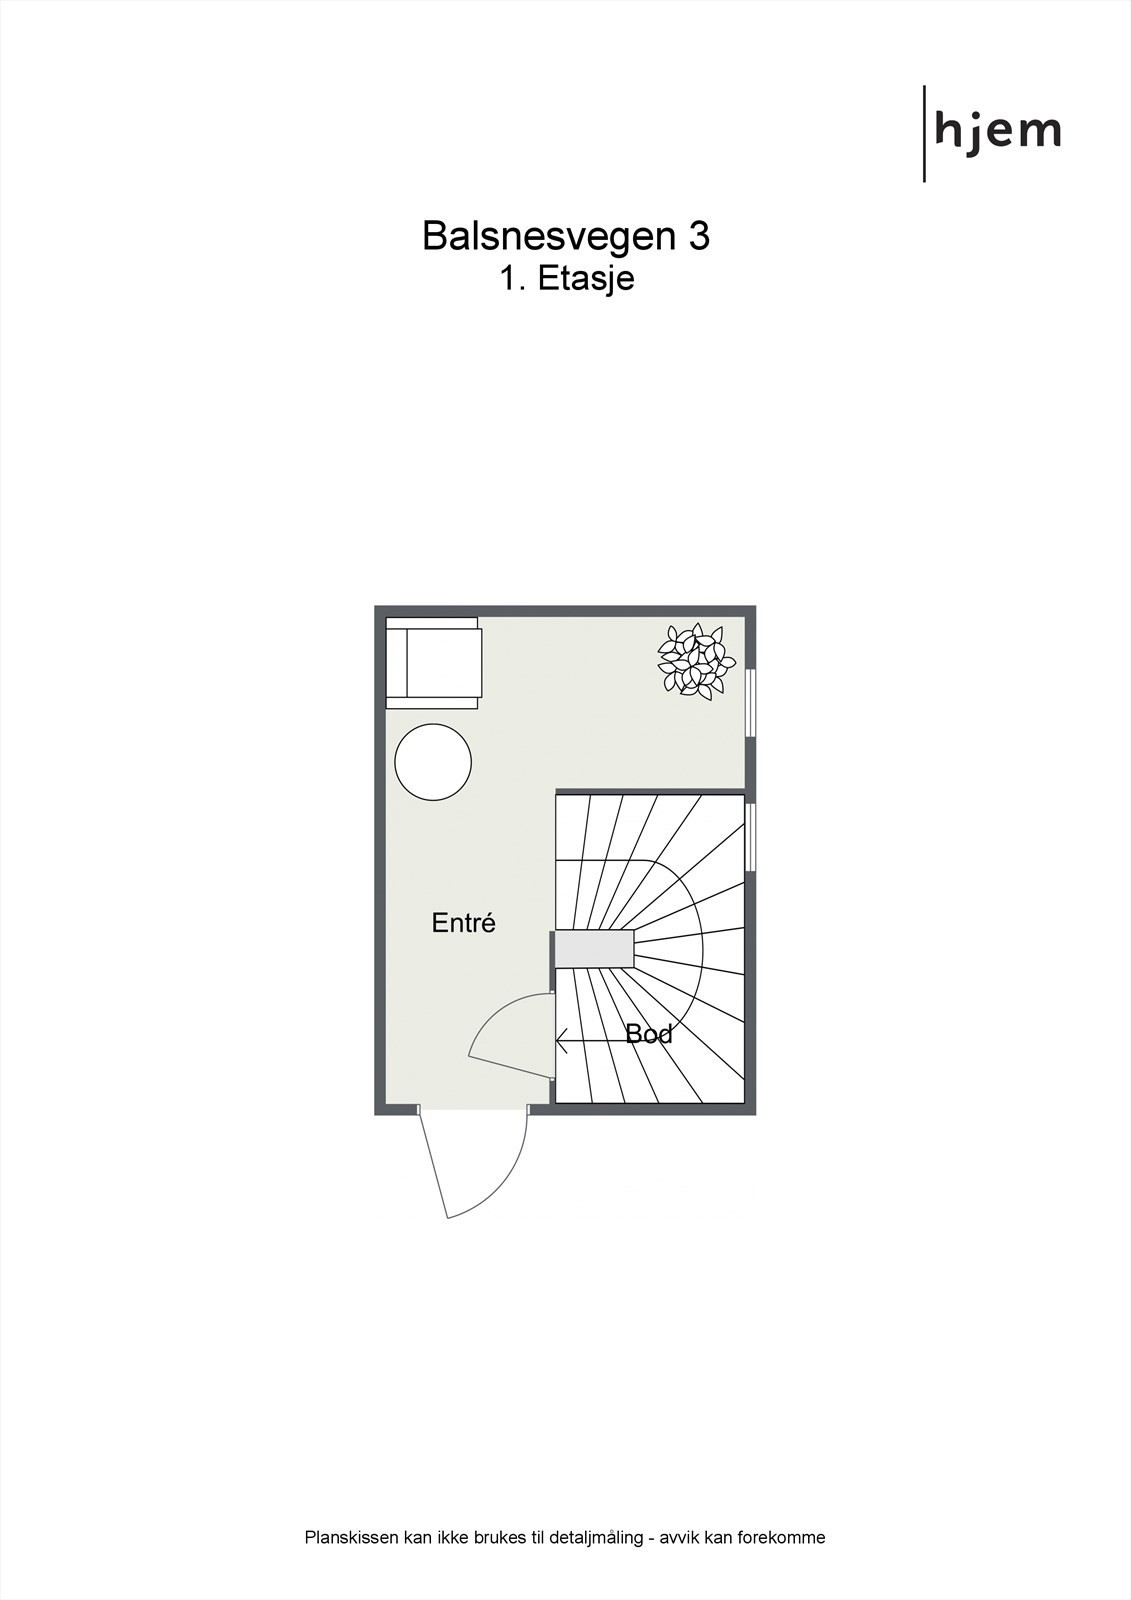 Floorplan letterhead - Balsnesvegen 3 - 1. Etasje - 2D Floor Plan.jpg